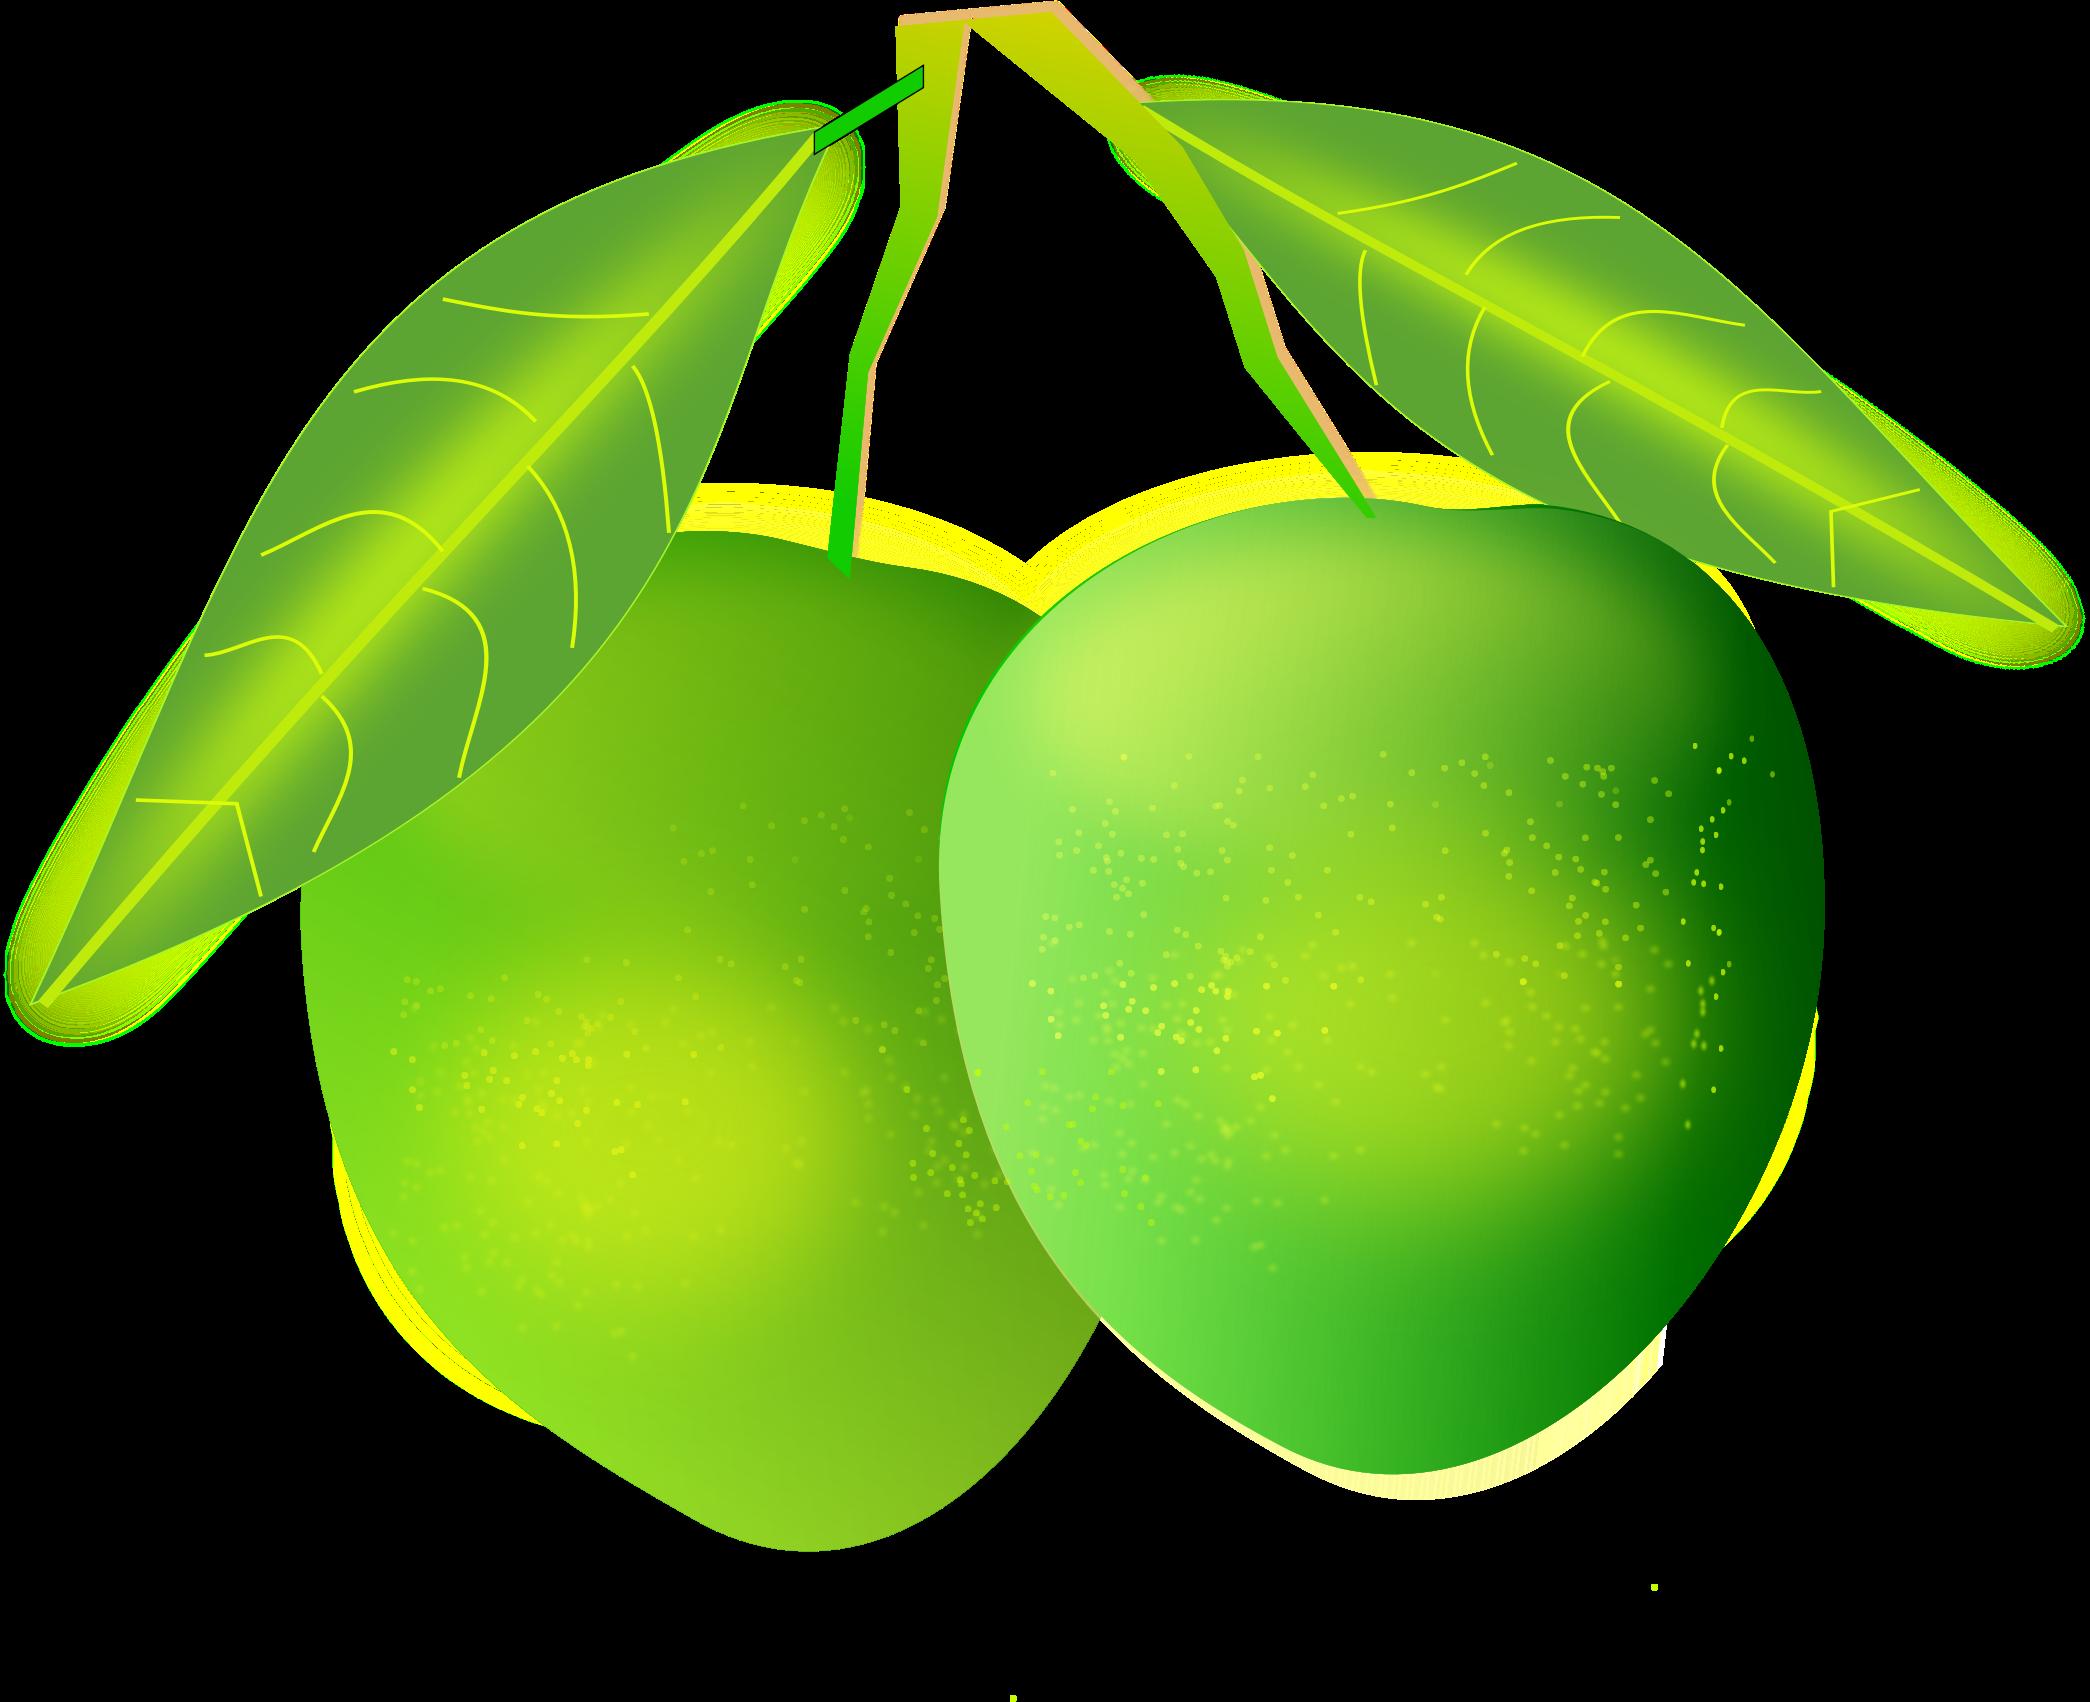 Mango Clipart PNG Image